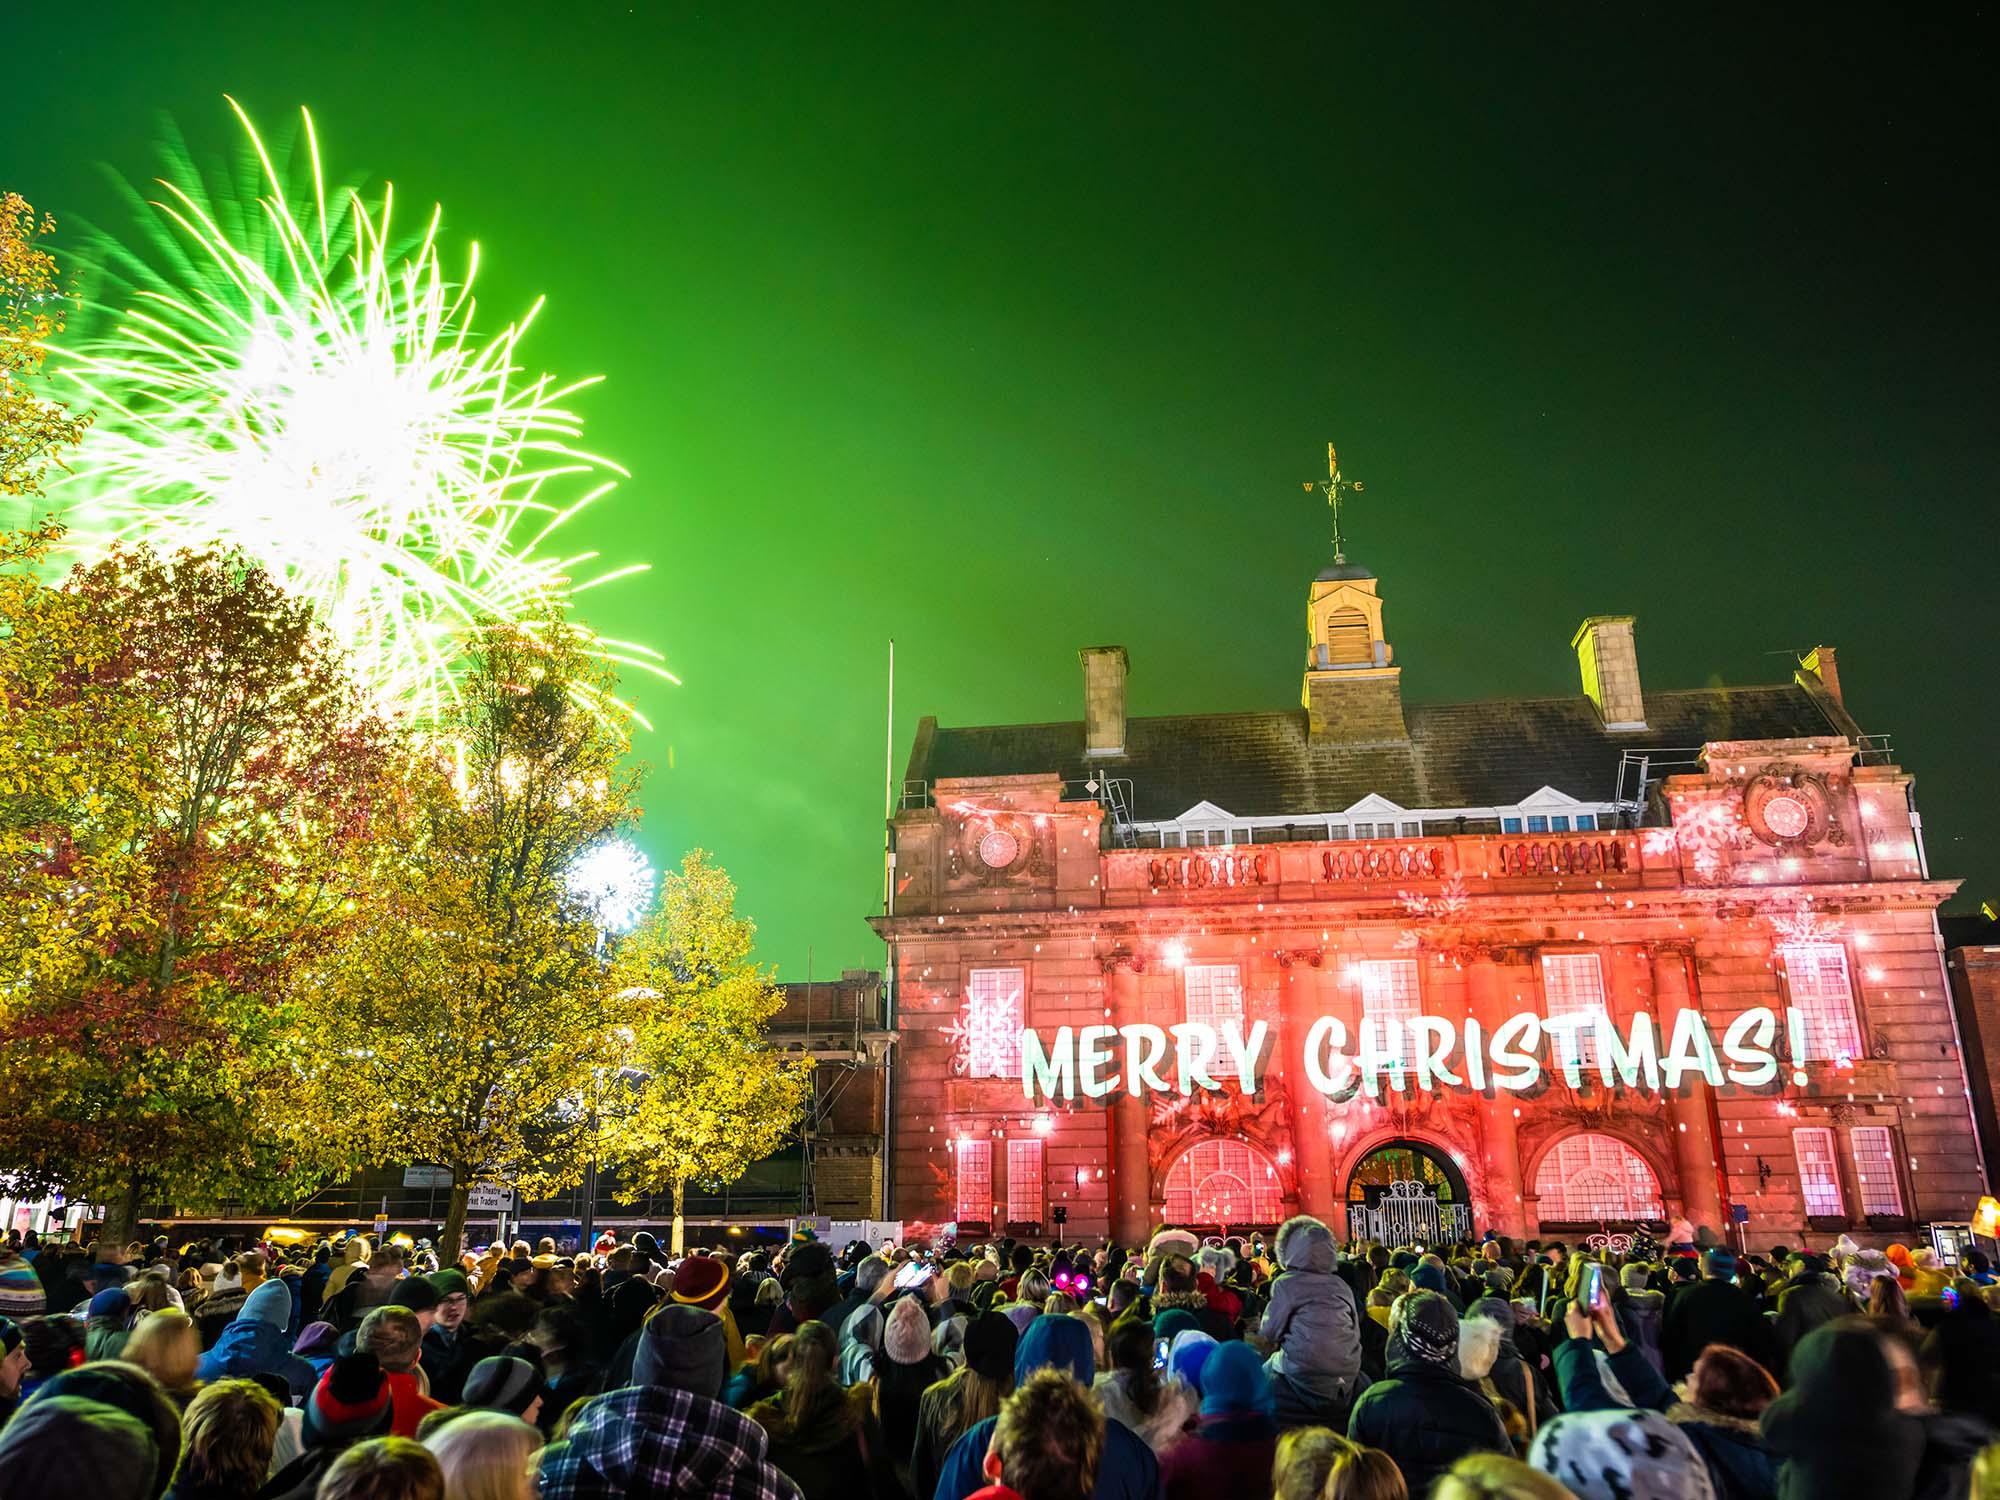 Lumen Light Festival, Christmas Projection show on Municipal Hall